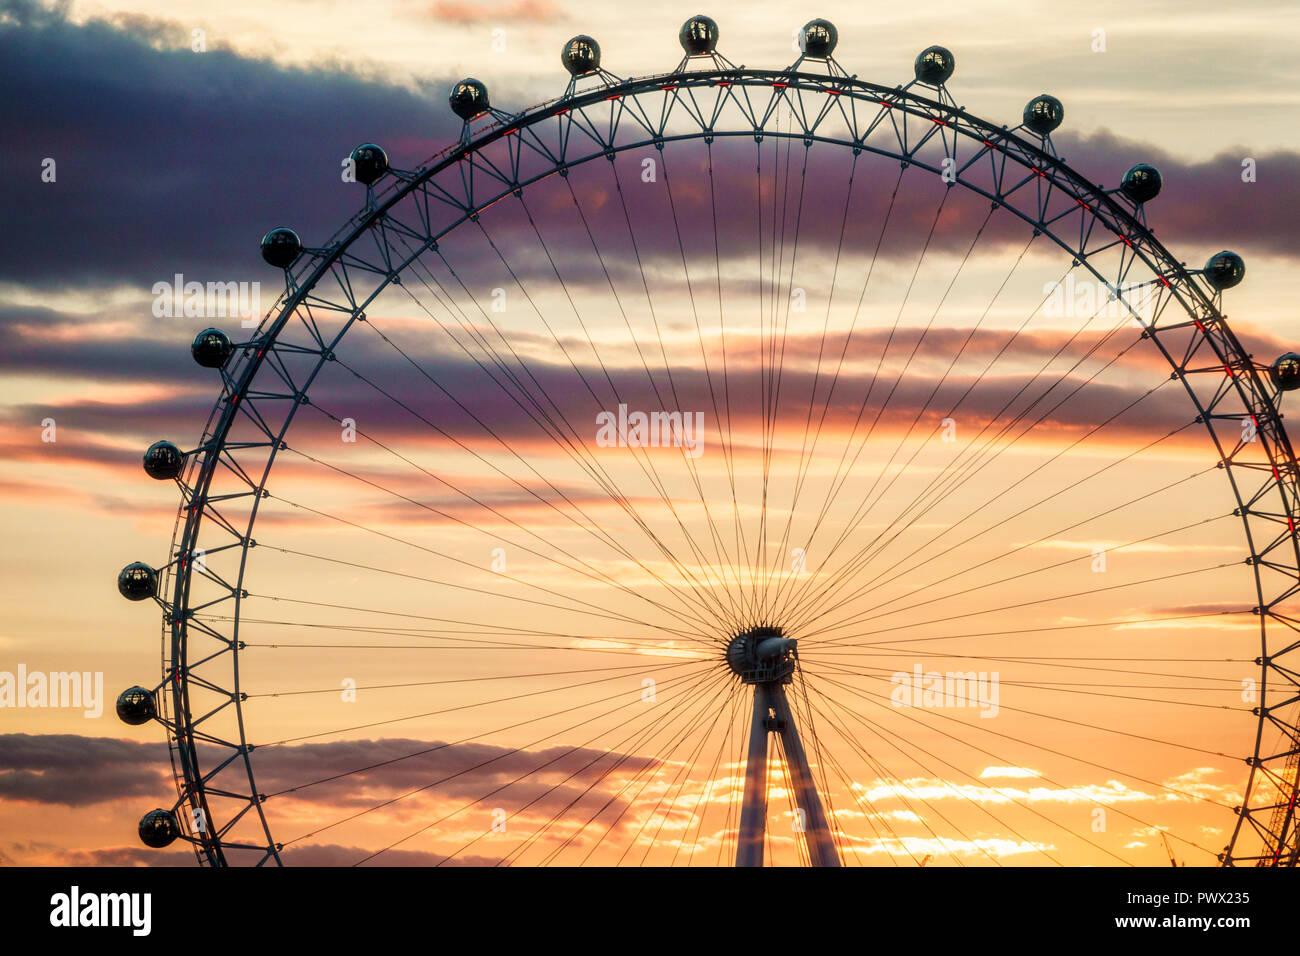 Londres Angleterre Royaume-Uni Grande-bretagne Lambeth Rive Sud grande roue London Eye attraction roue d'observation marque Barfield Architects su Photo Stock